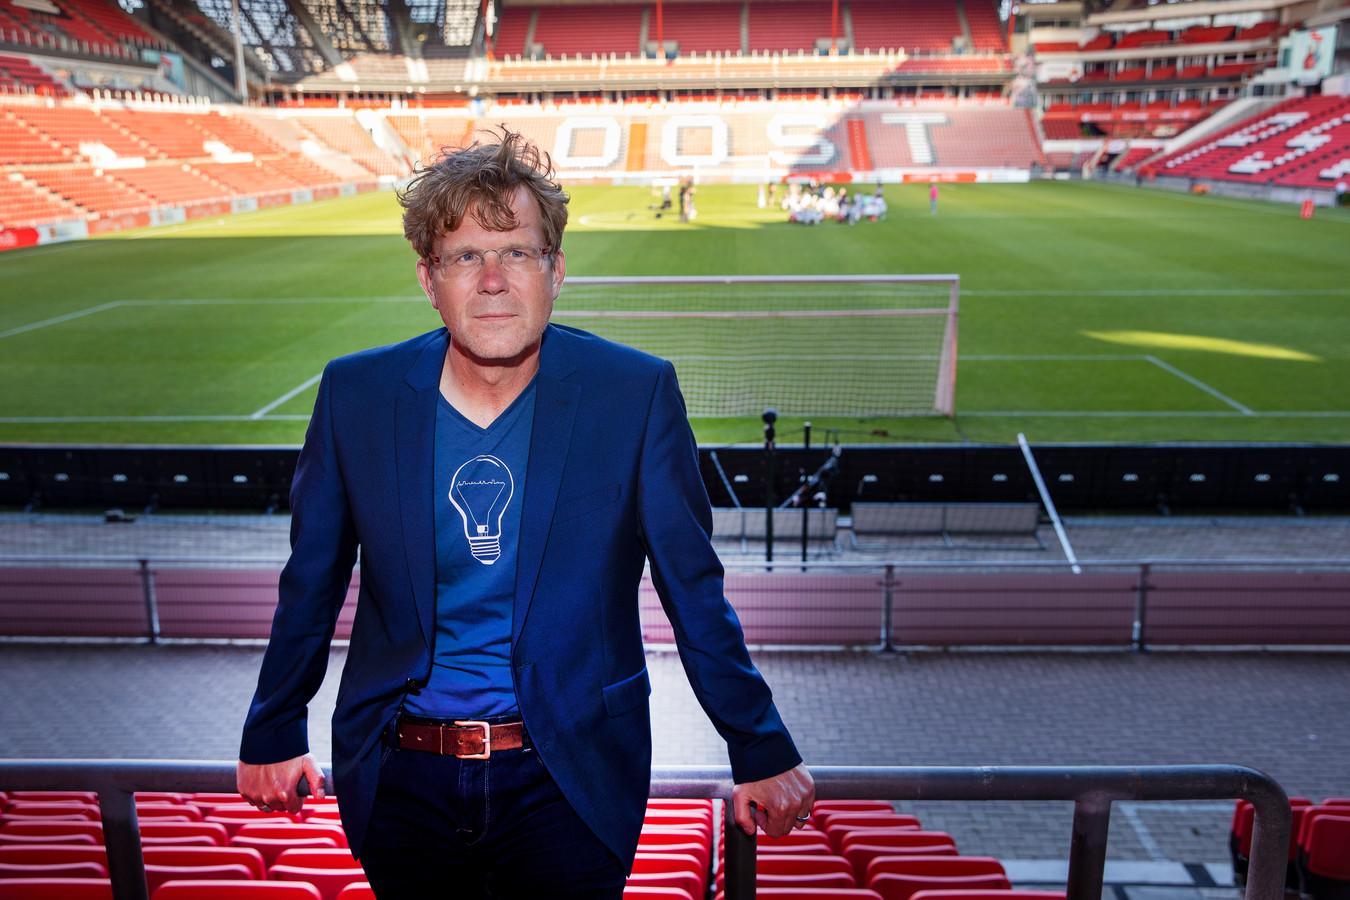 Harrie Timmermans stopt als voorzitter van Supportersvereniging PSV